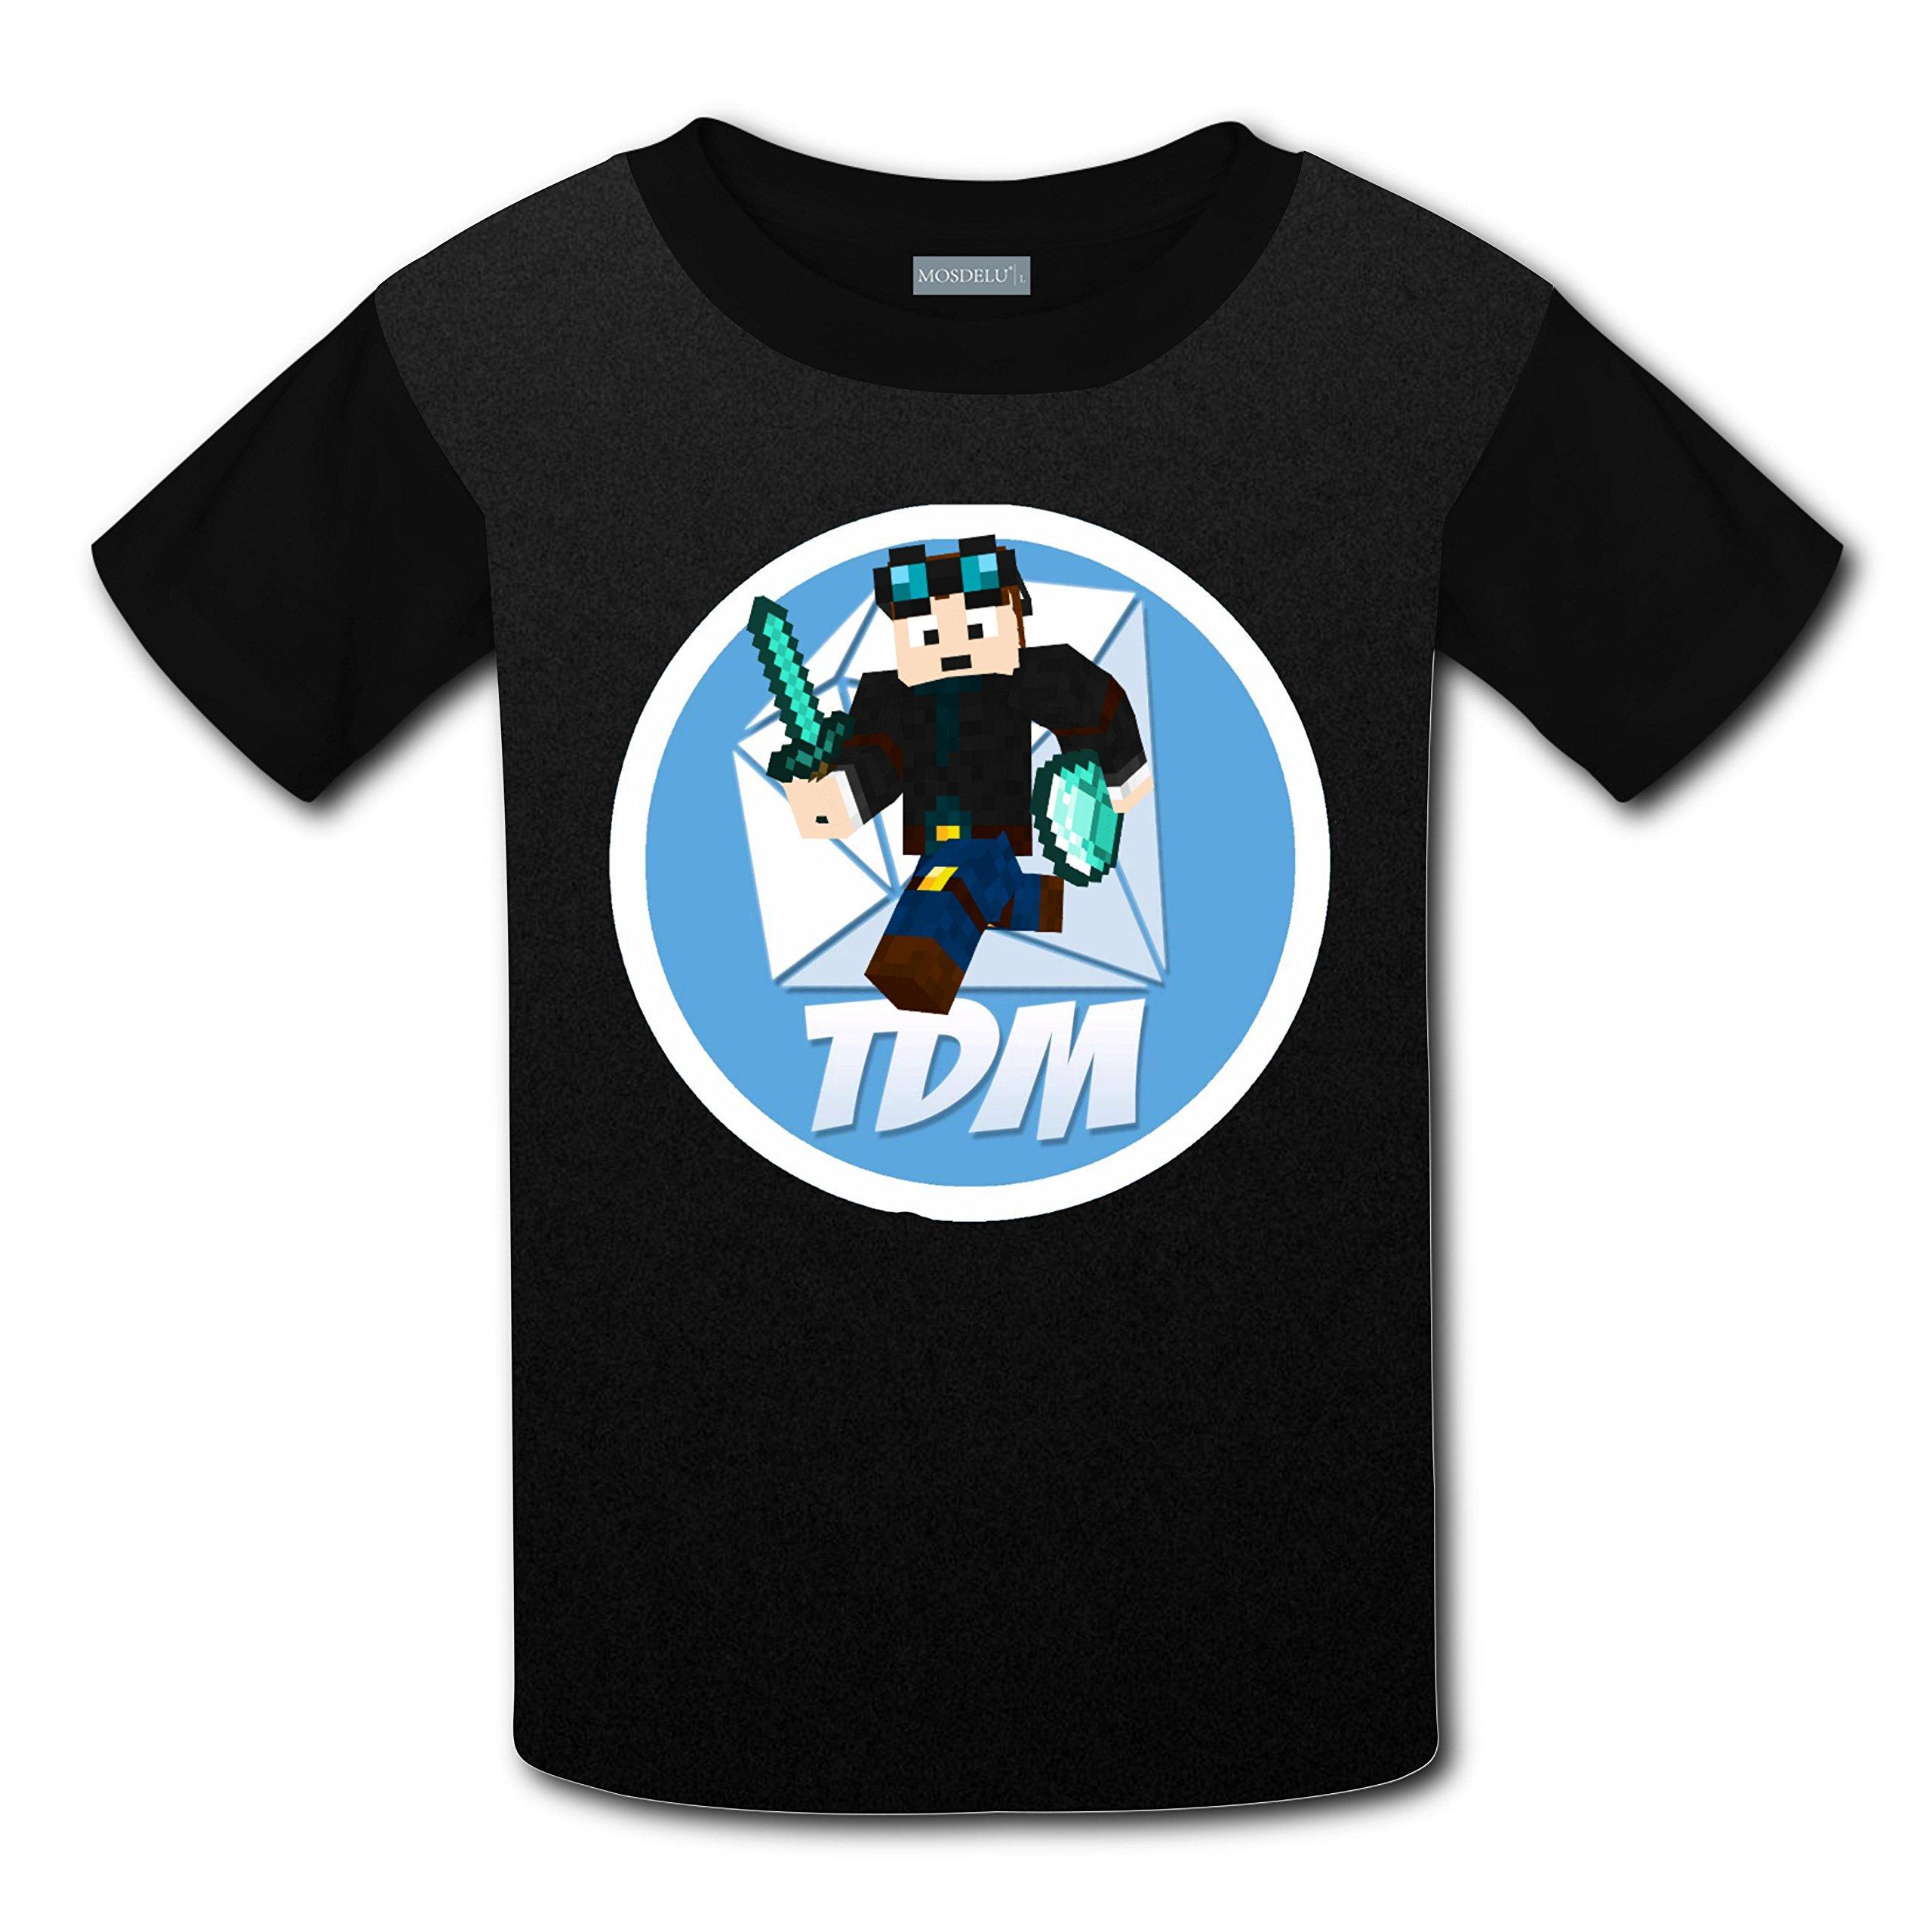 The Diamond Minecart TDM Logo 3D Printed Short Sleeve Crew Neck T-Shirt For Boys